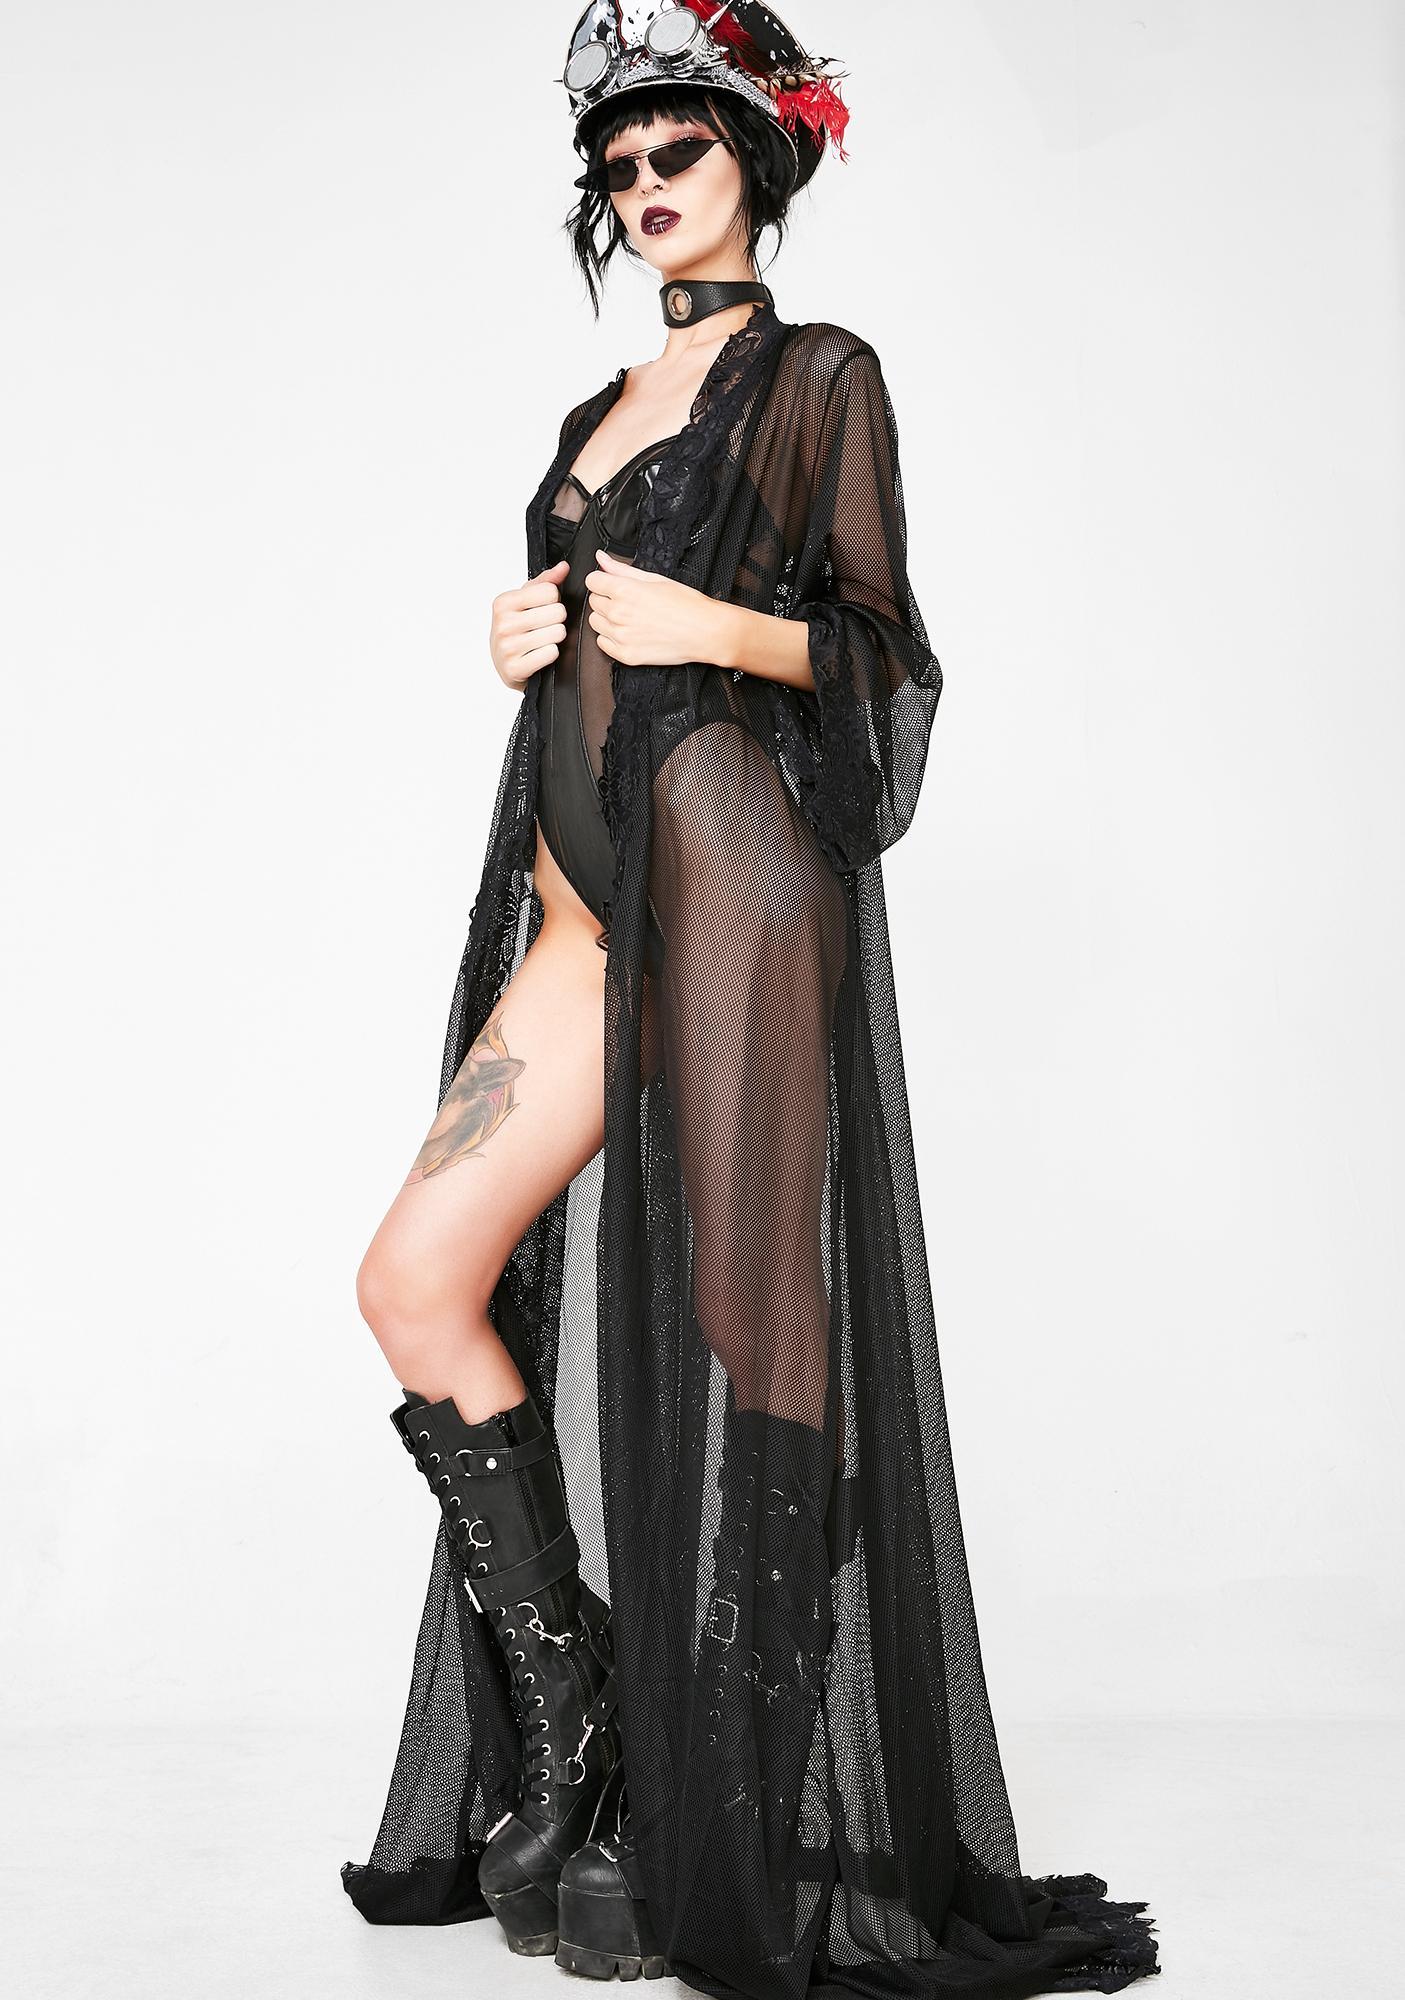 Kiki Riki Vampy Visionz Kimono